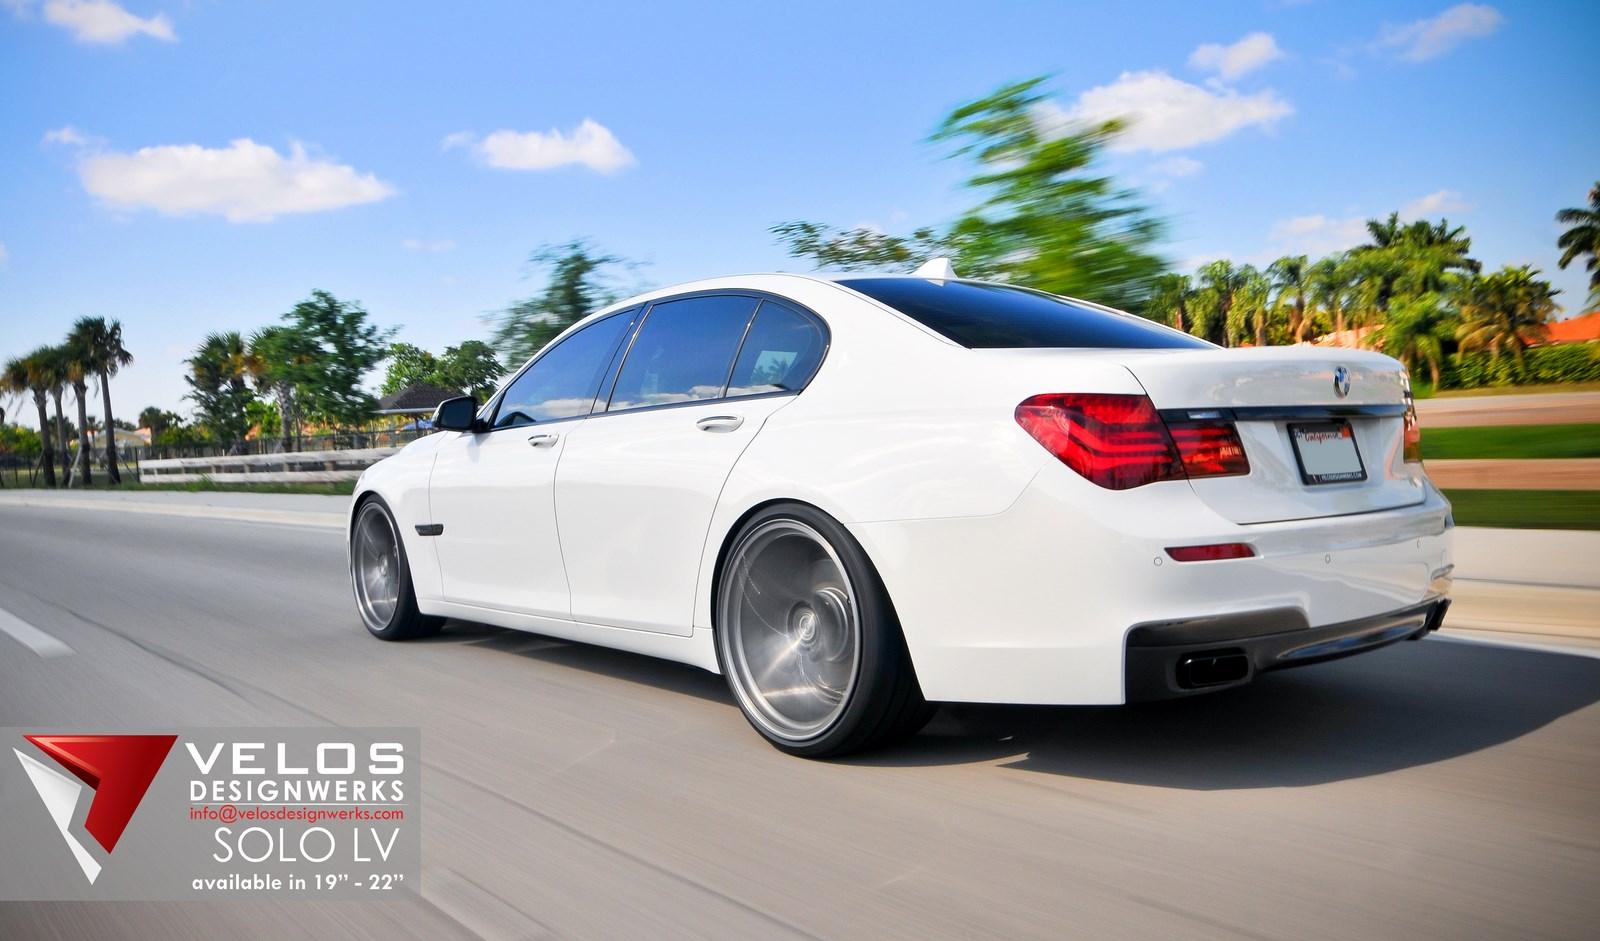 2013 Bmw 750i On Velos Designwerks 22 Quot Solo Lv Wheels